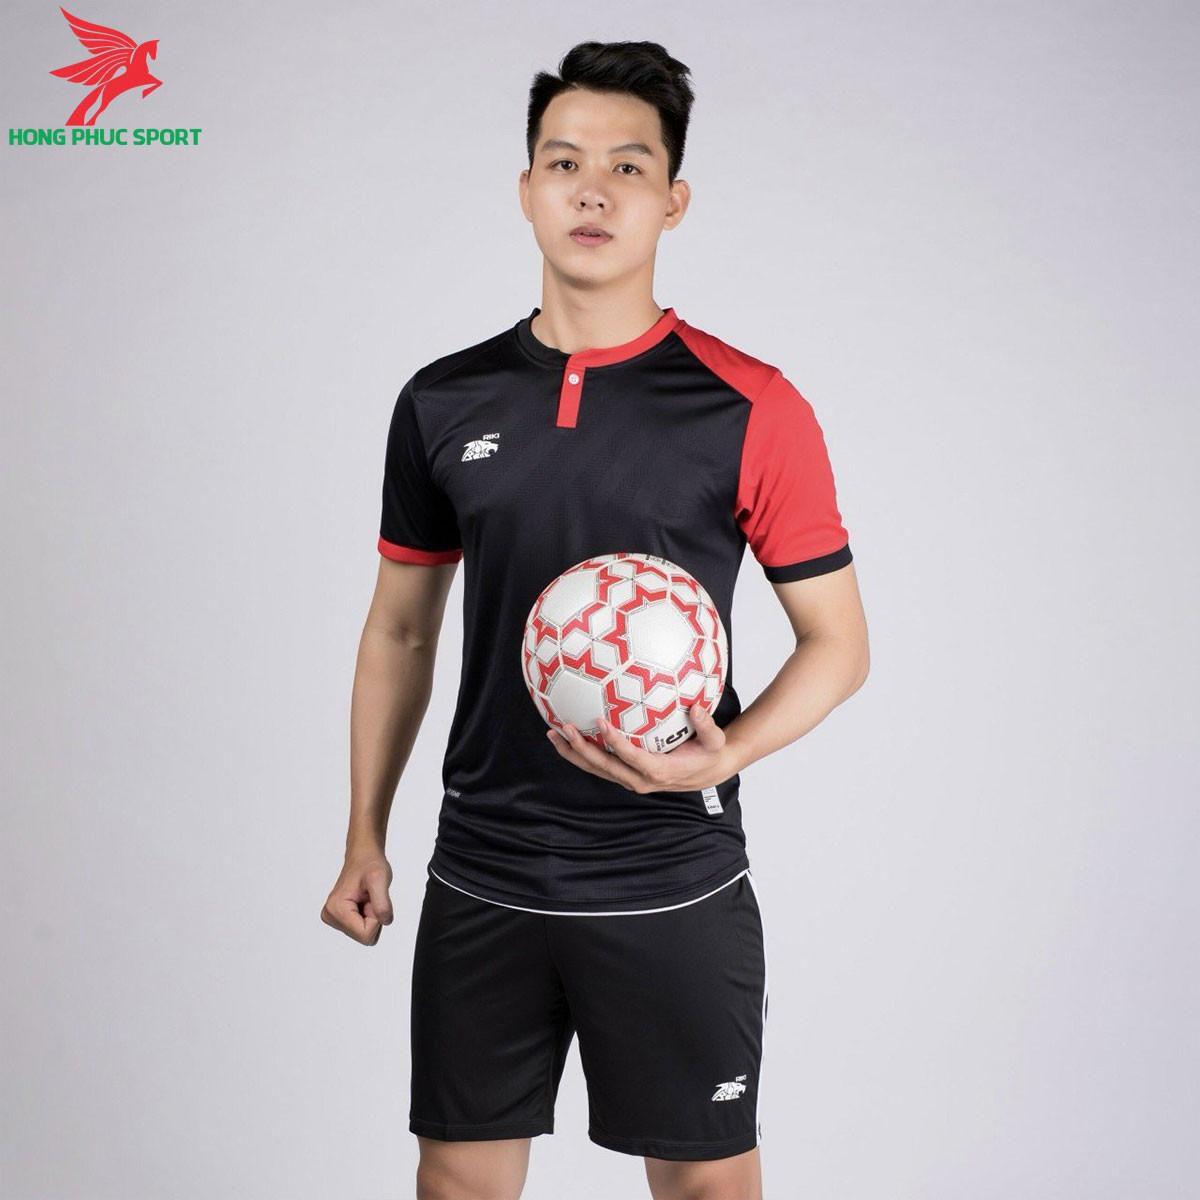 https://cdn.hongphucsport.com/unsafe/s4.shopbay.vn/files/285/ao-khong-logo-riki-lostoran-mau-den-603e10ebab68e.jpg